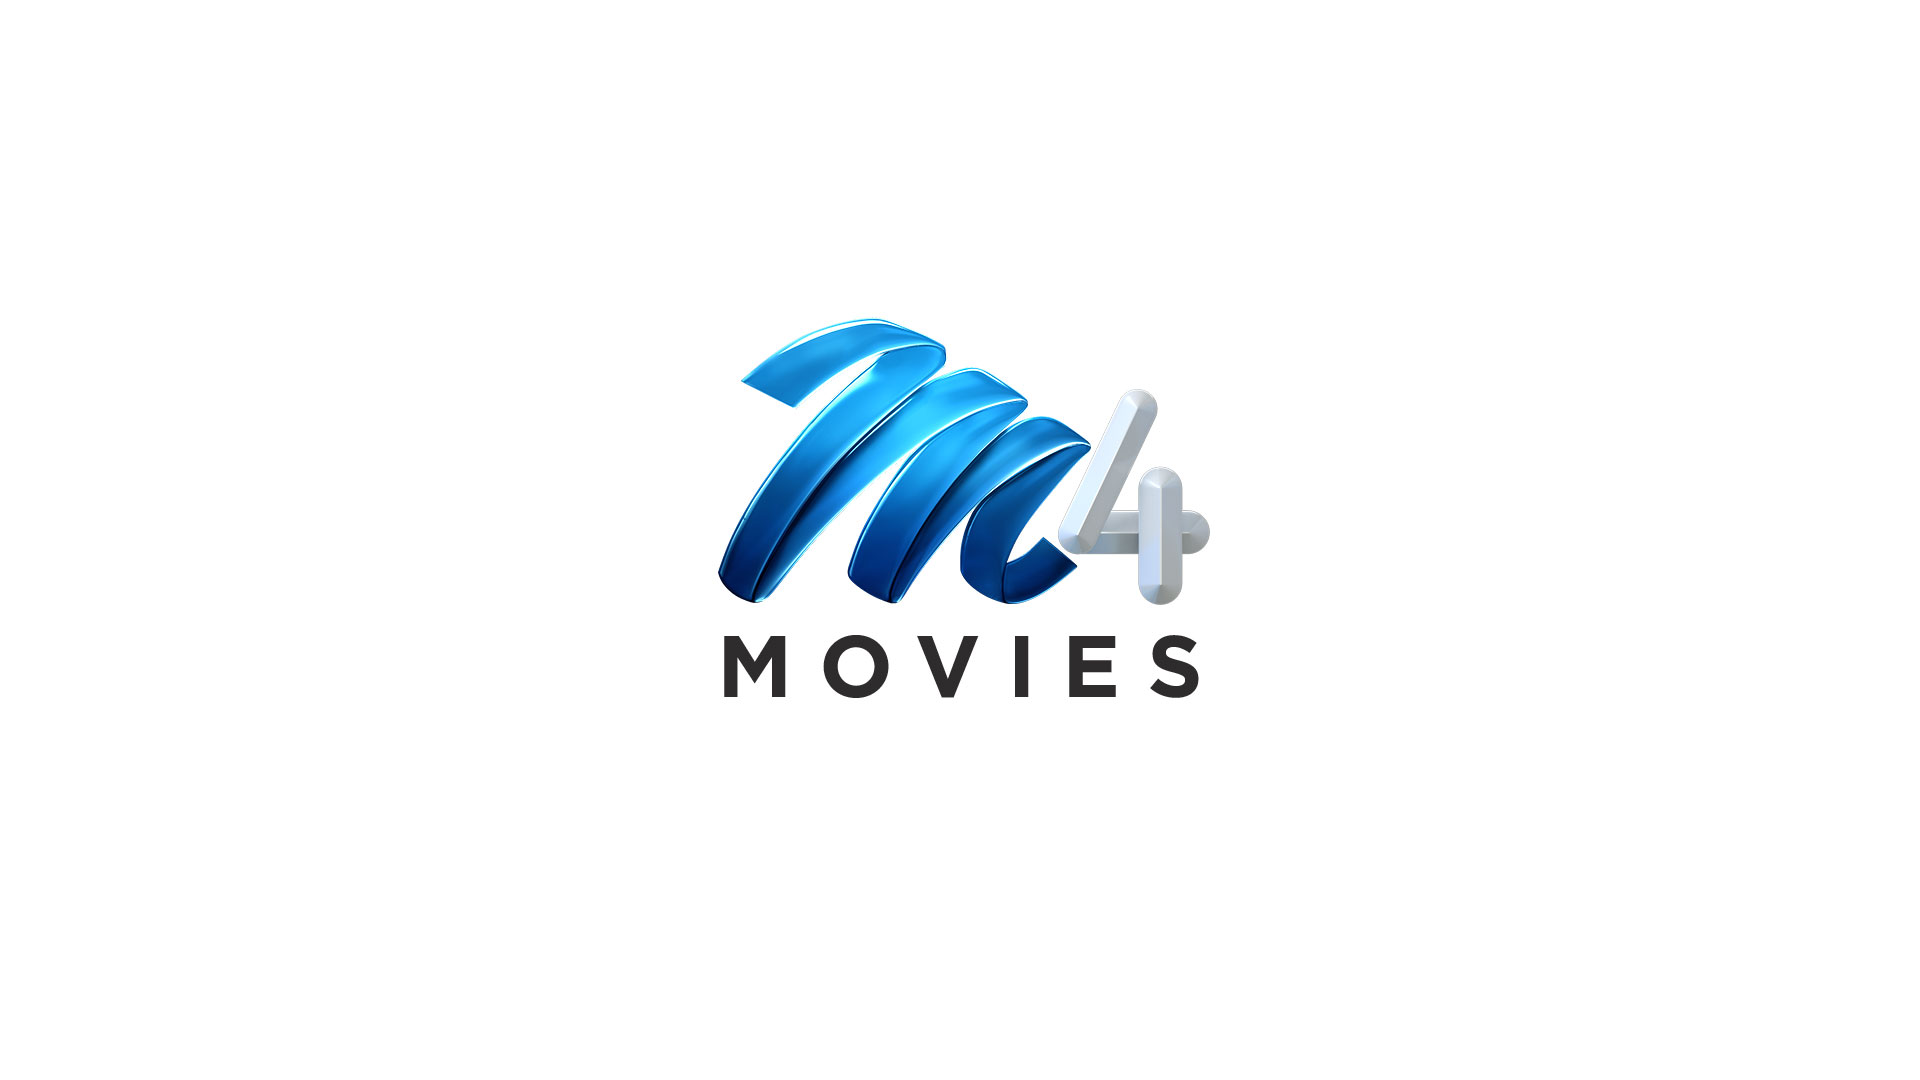 M-Net Movies 4